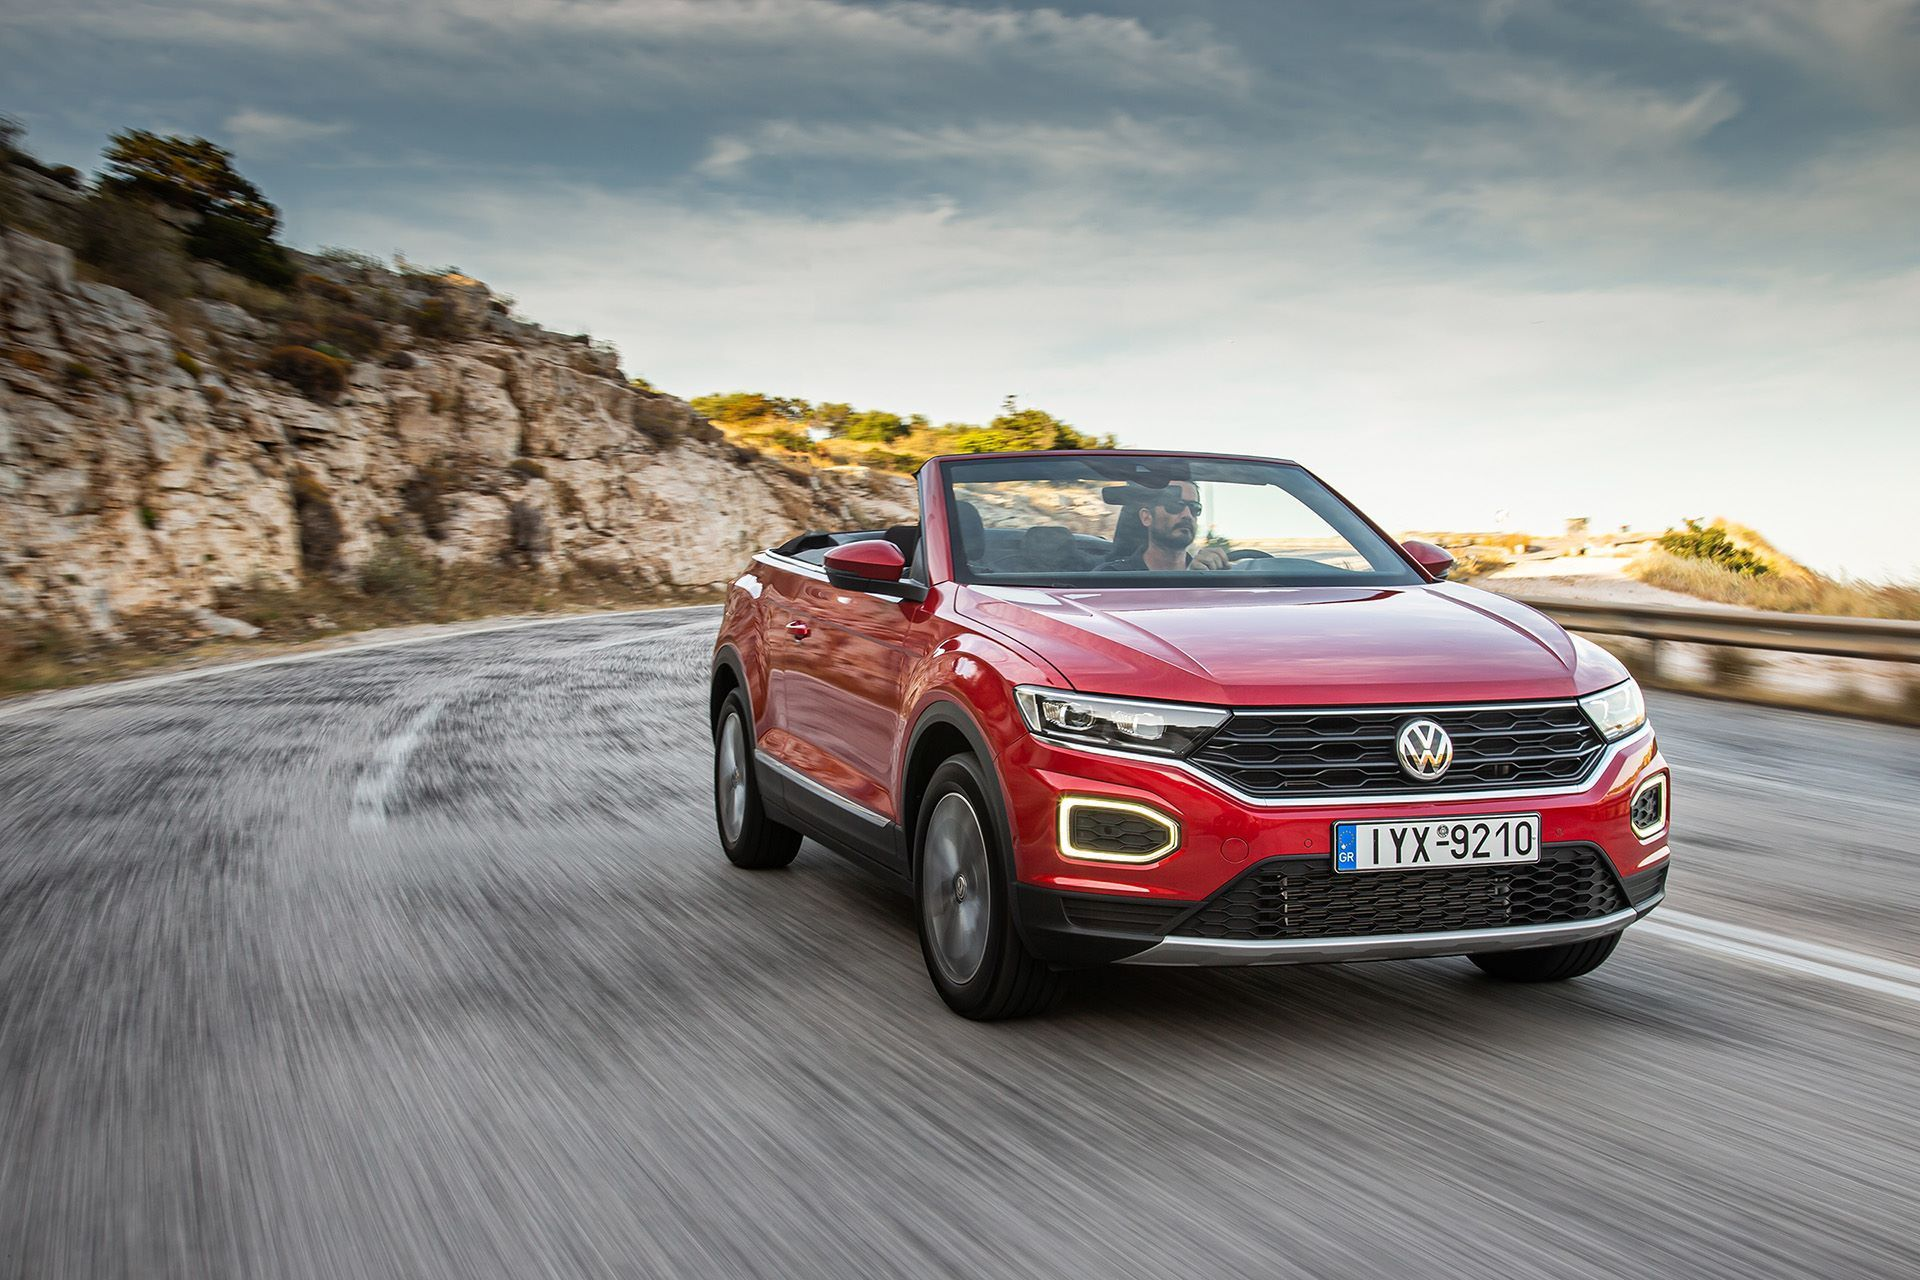 Volkswagen-T-Roc-Cabriolet-Greece-48